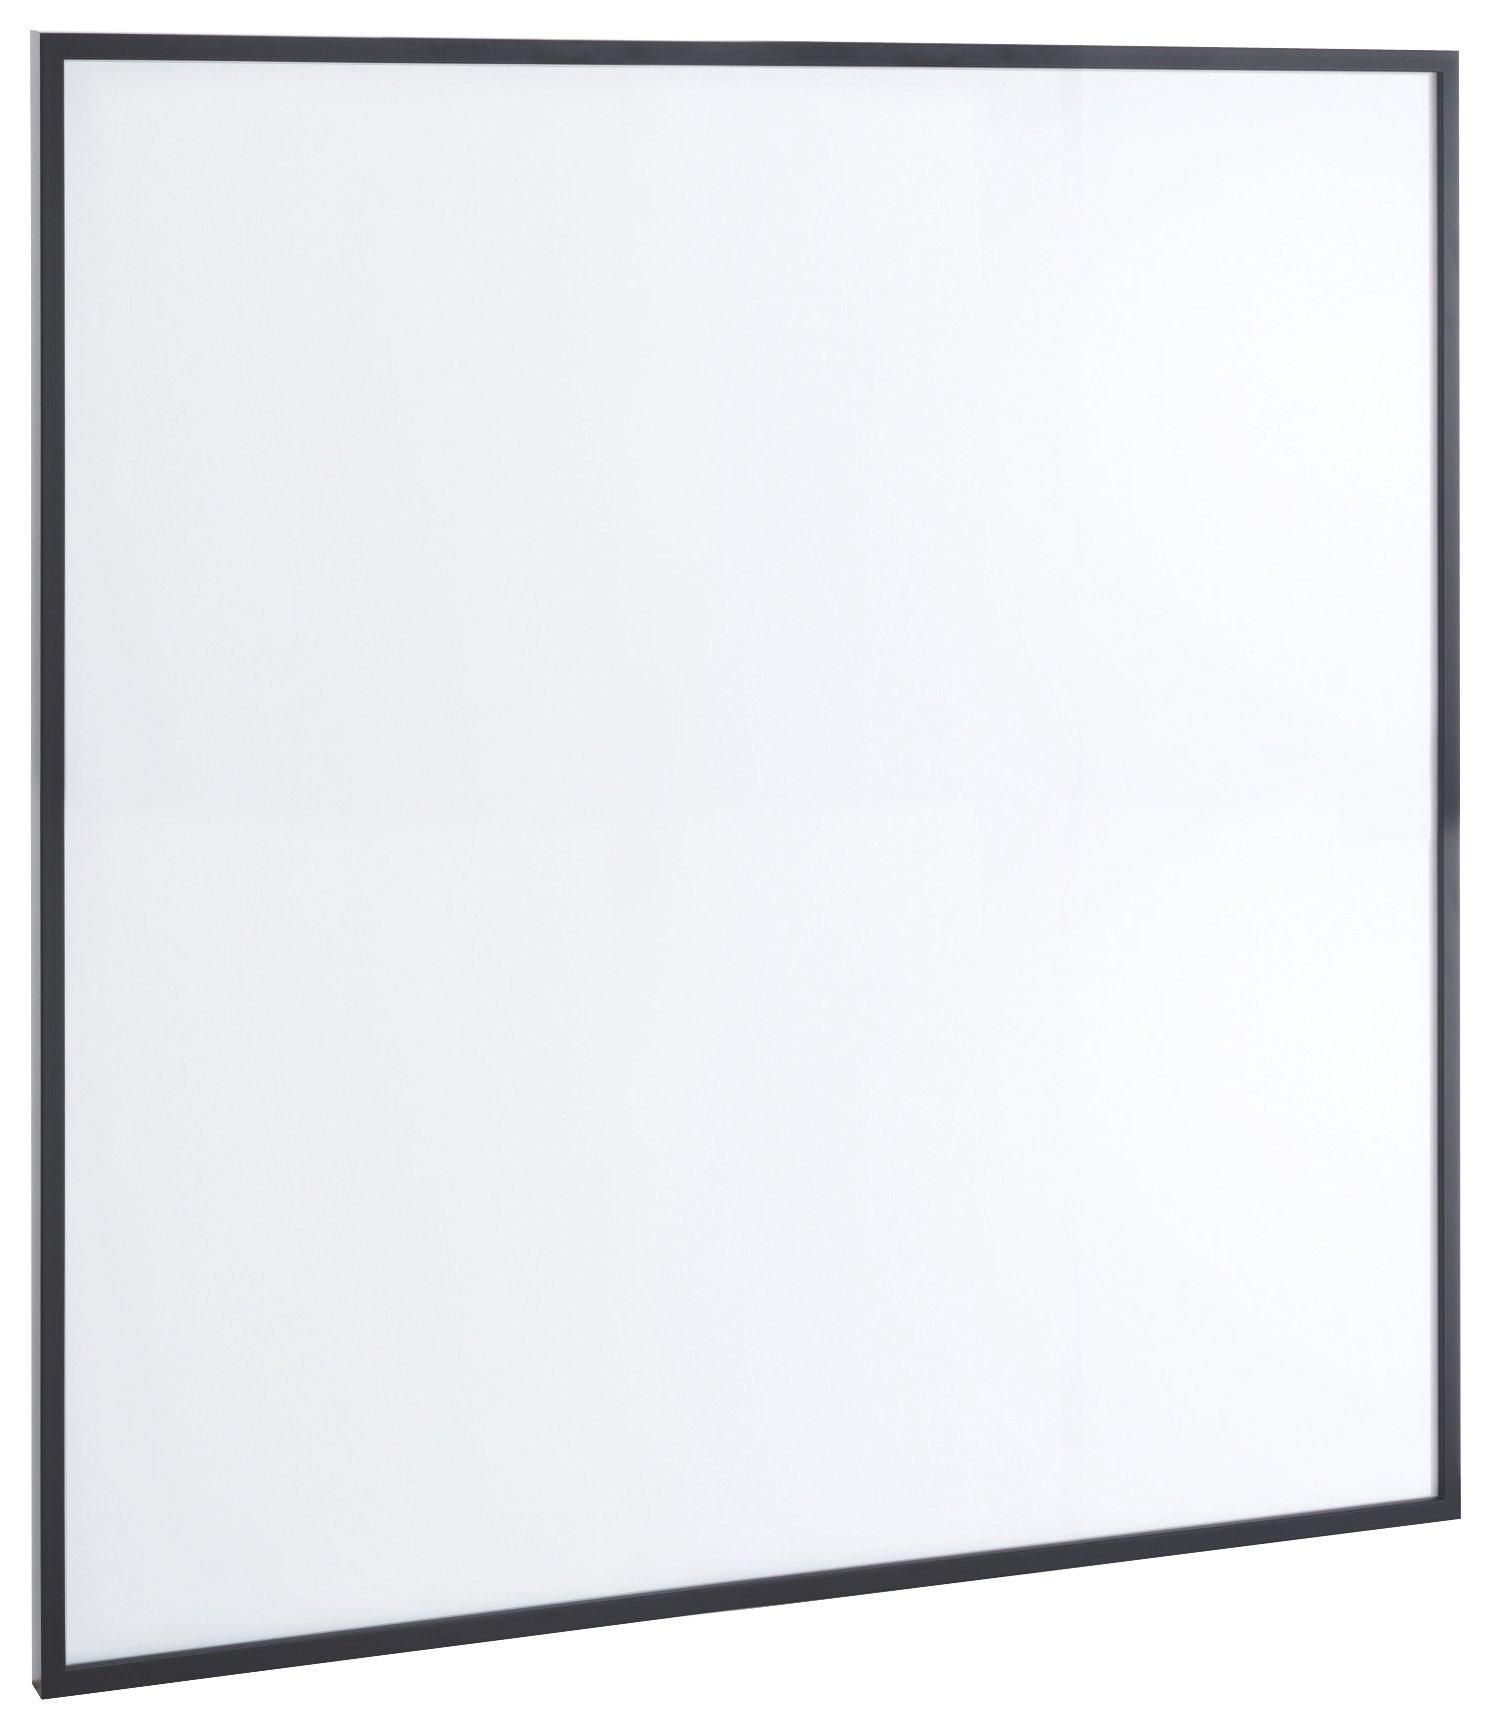 Image of Habitat 23.6x23.6 Inch Picture Frame - Dark Birch